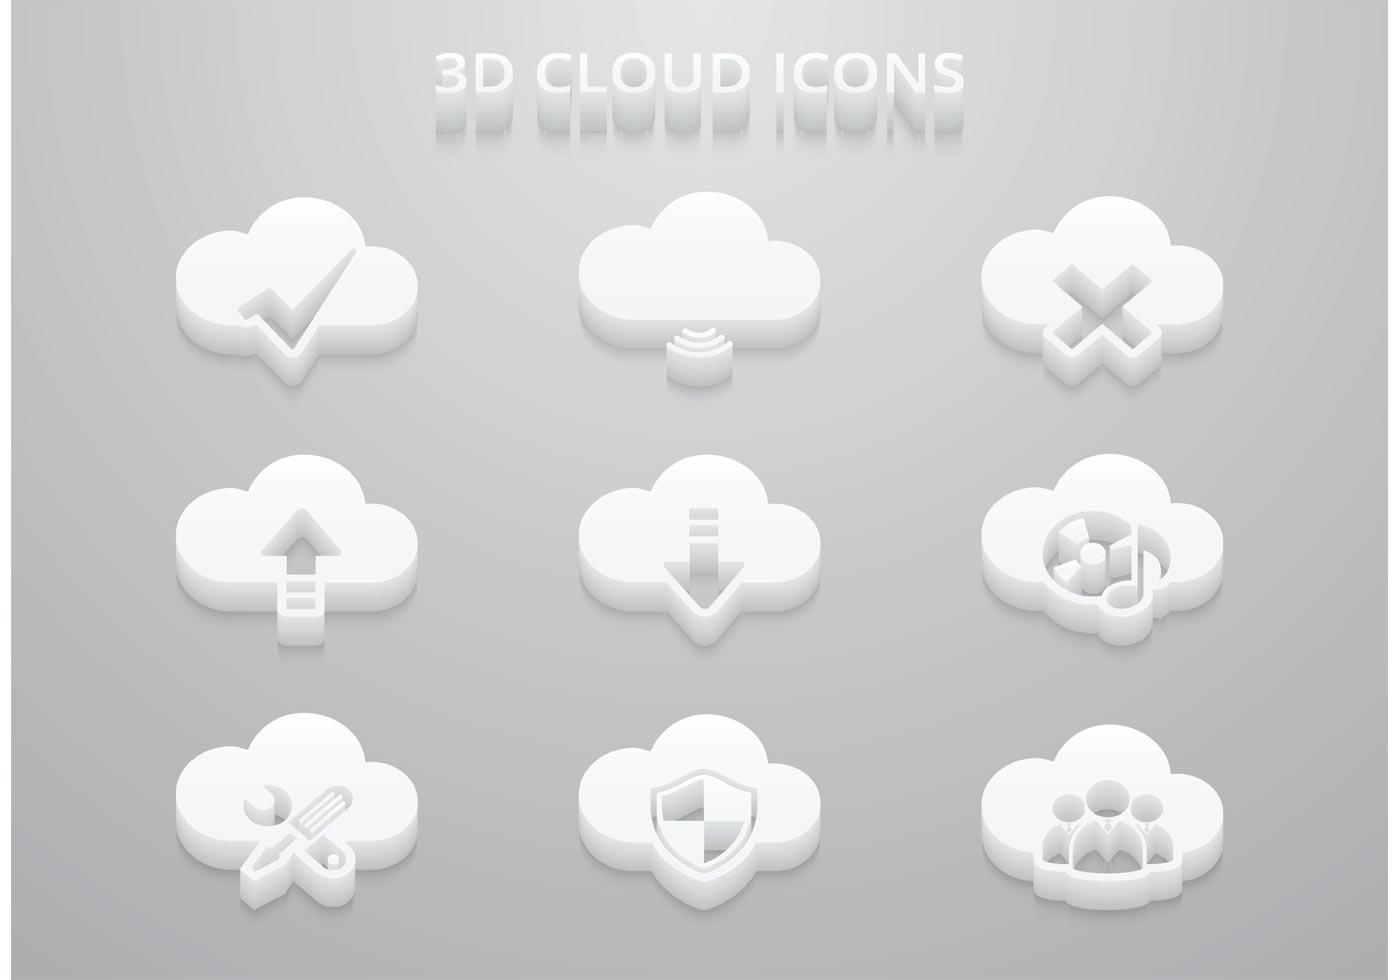 3D Cloud Vector Icons - Download Free Vector Art, Stock ...